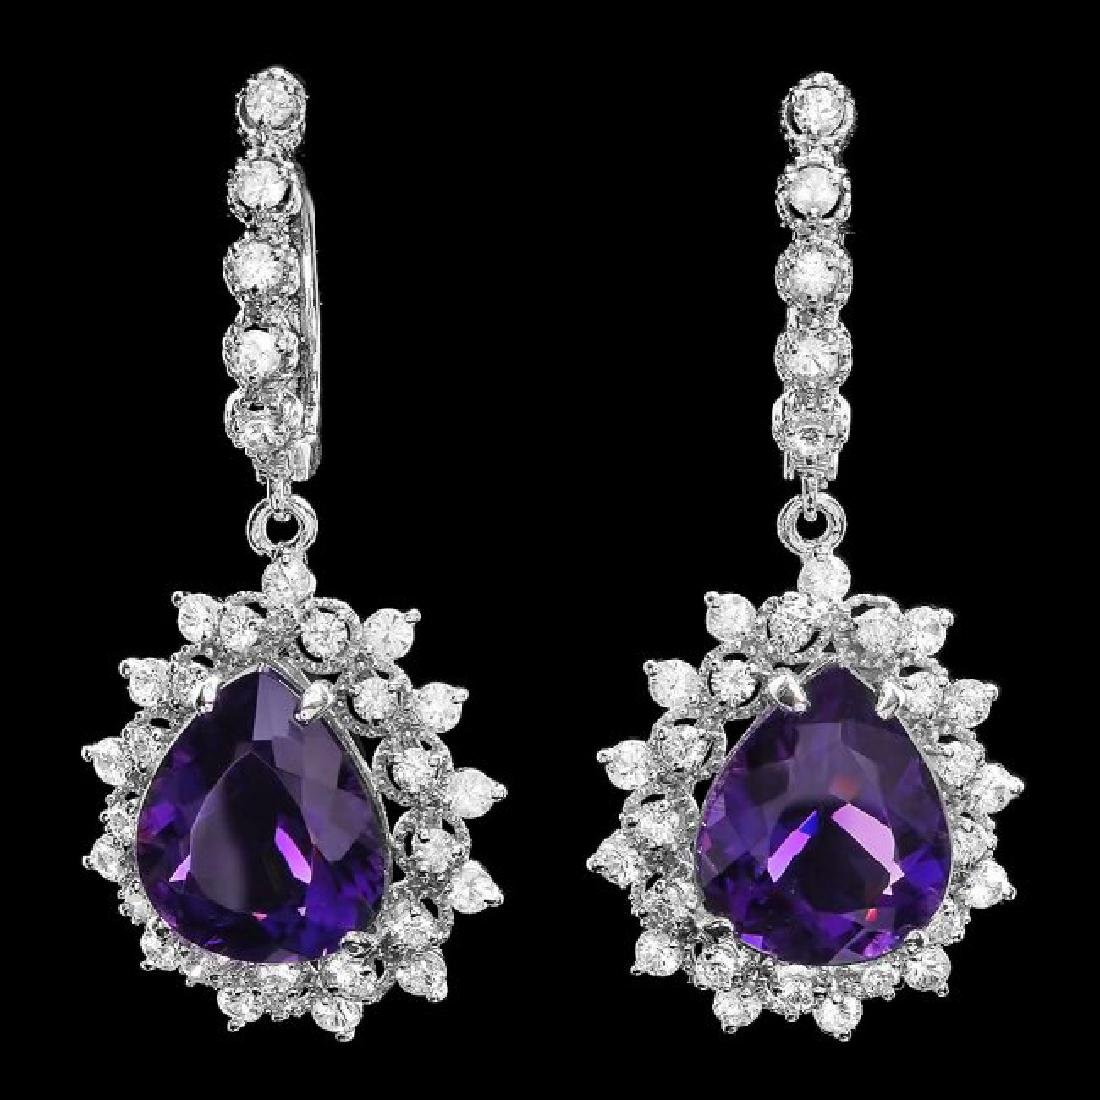 14k Gold 11.00ct Amethyst 2.00ct Diamond Earrings